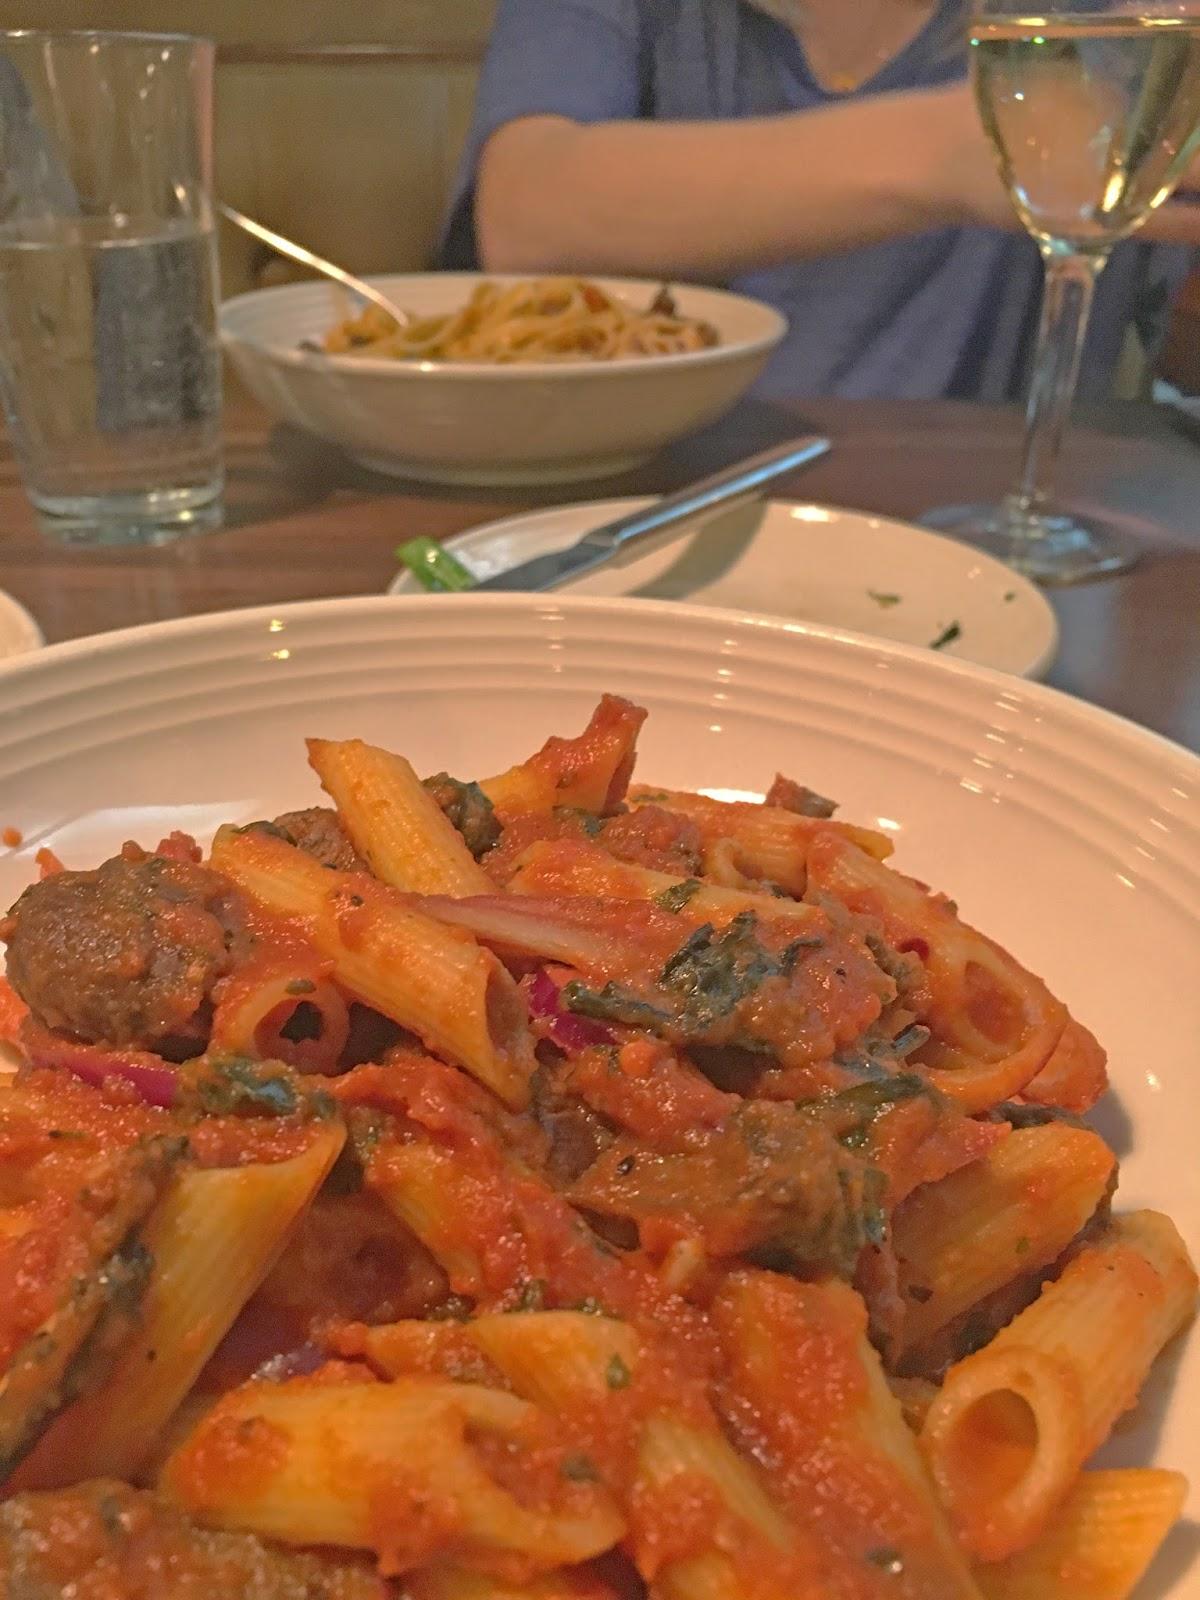 vegan pasta at Vivo 53 - an Italian restaurant in Fort Worth, Texas